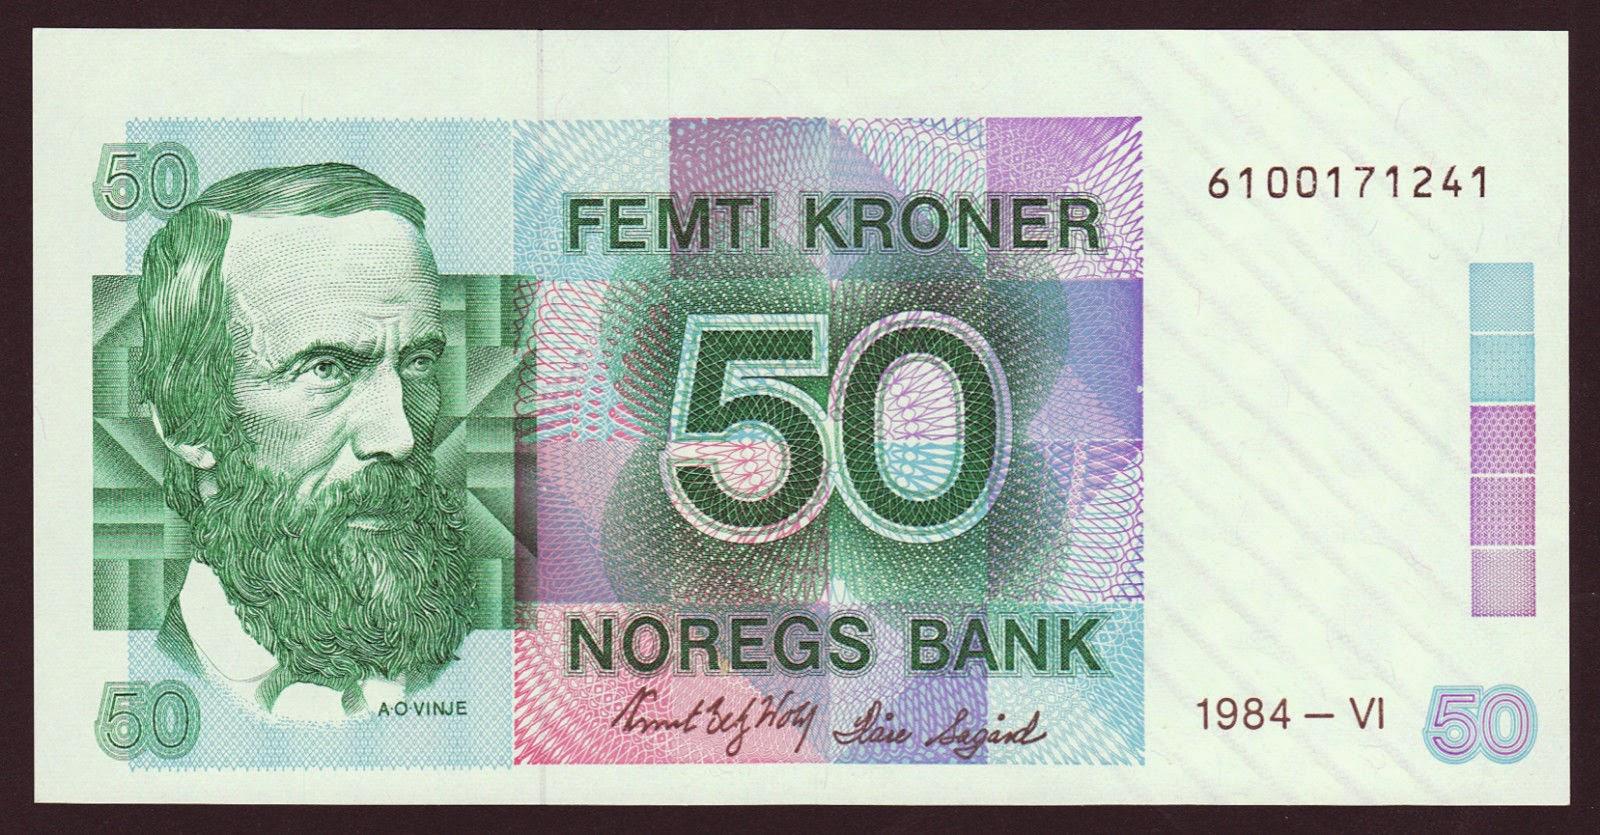 Norway Banknotes 50 Kroner banknote 1984 Aasmund Olavsson Vinje